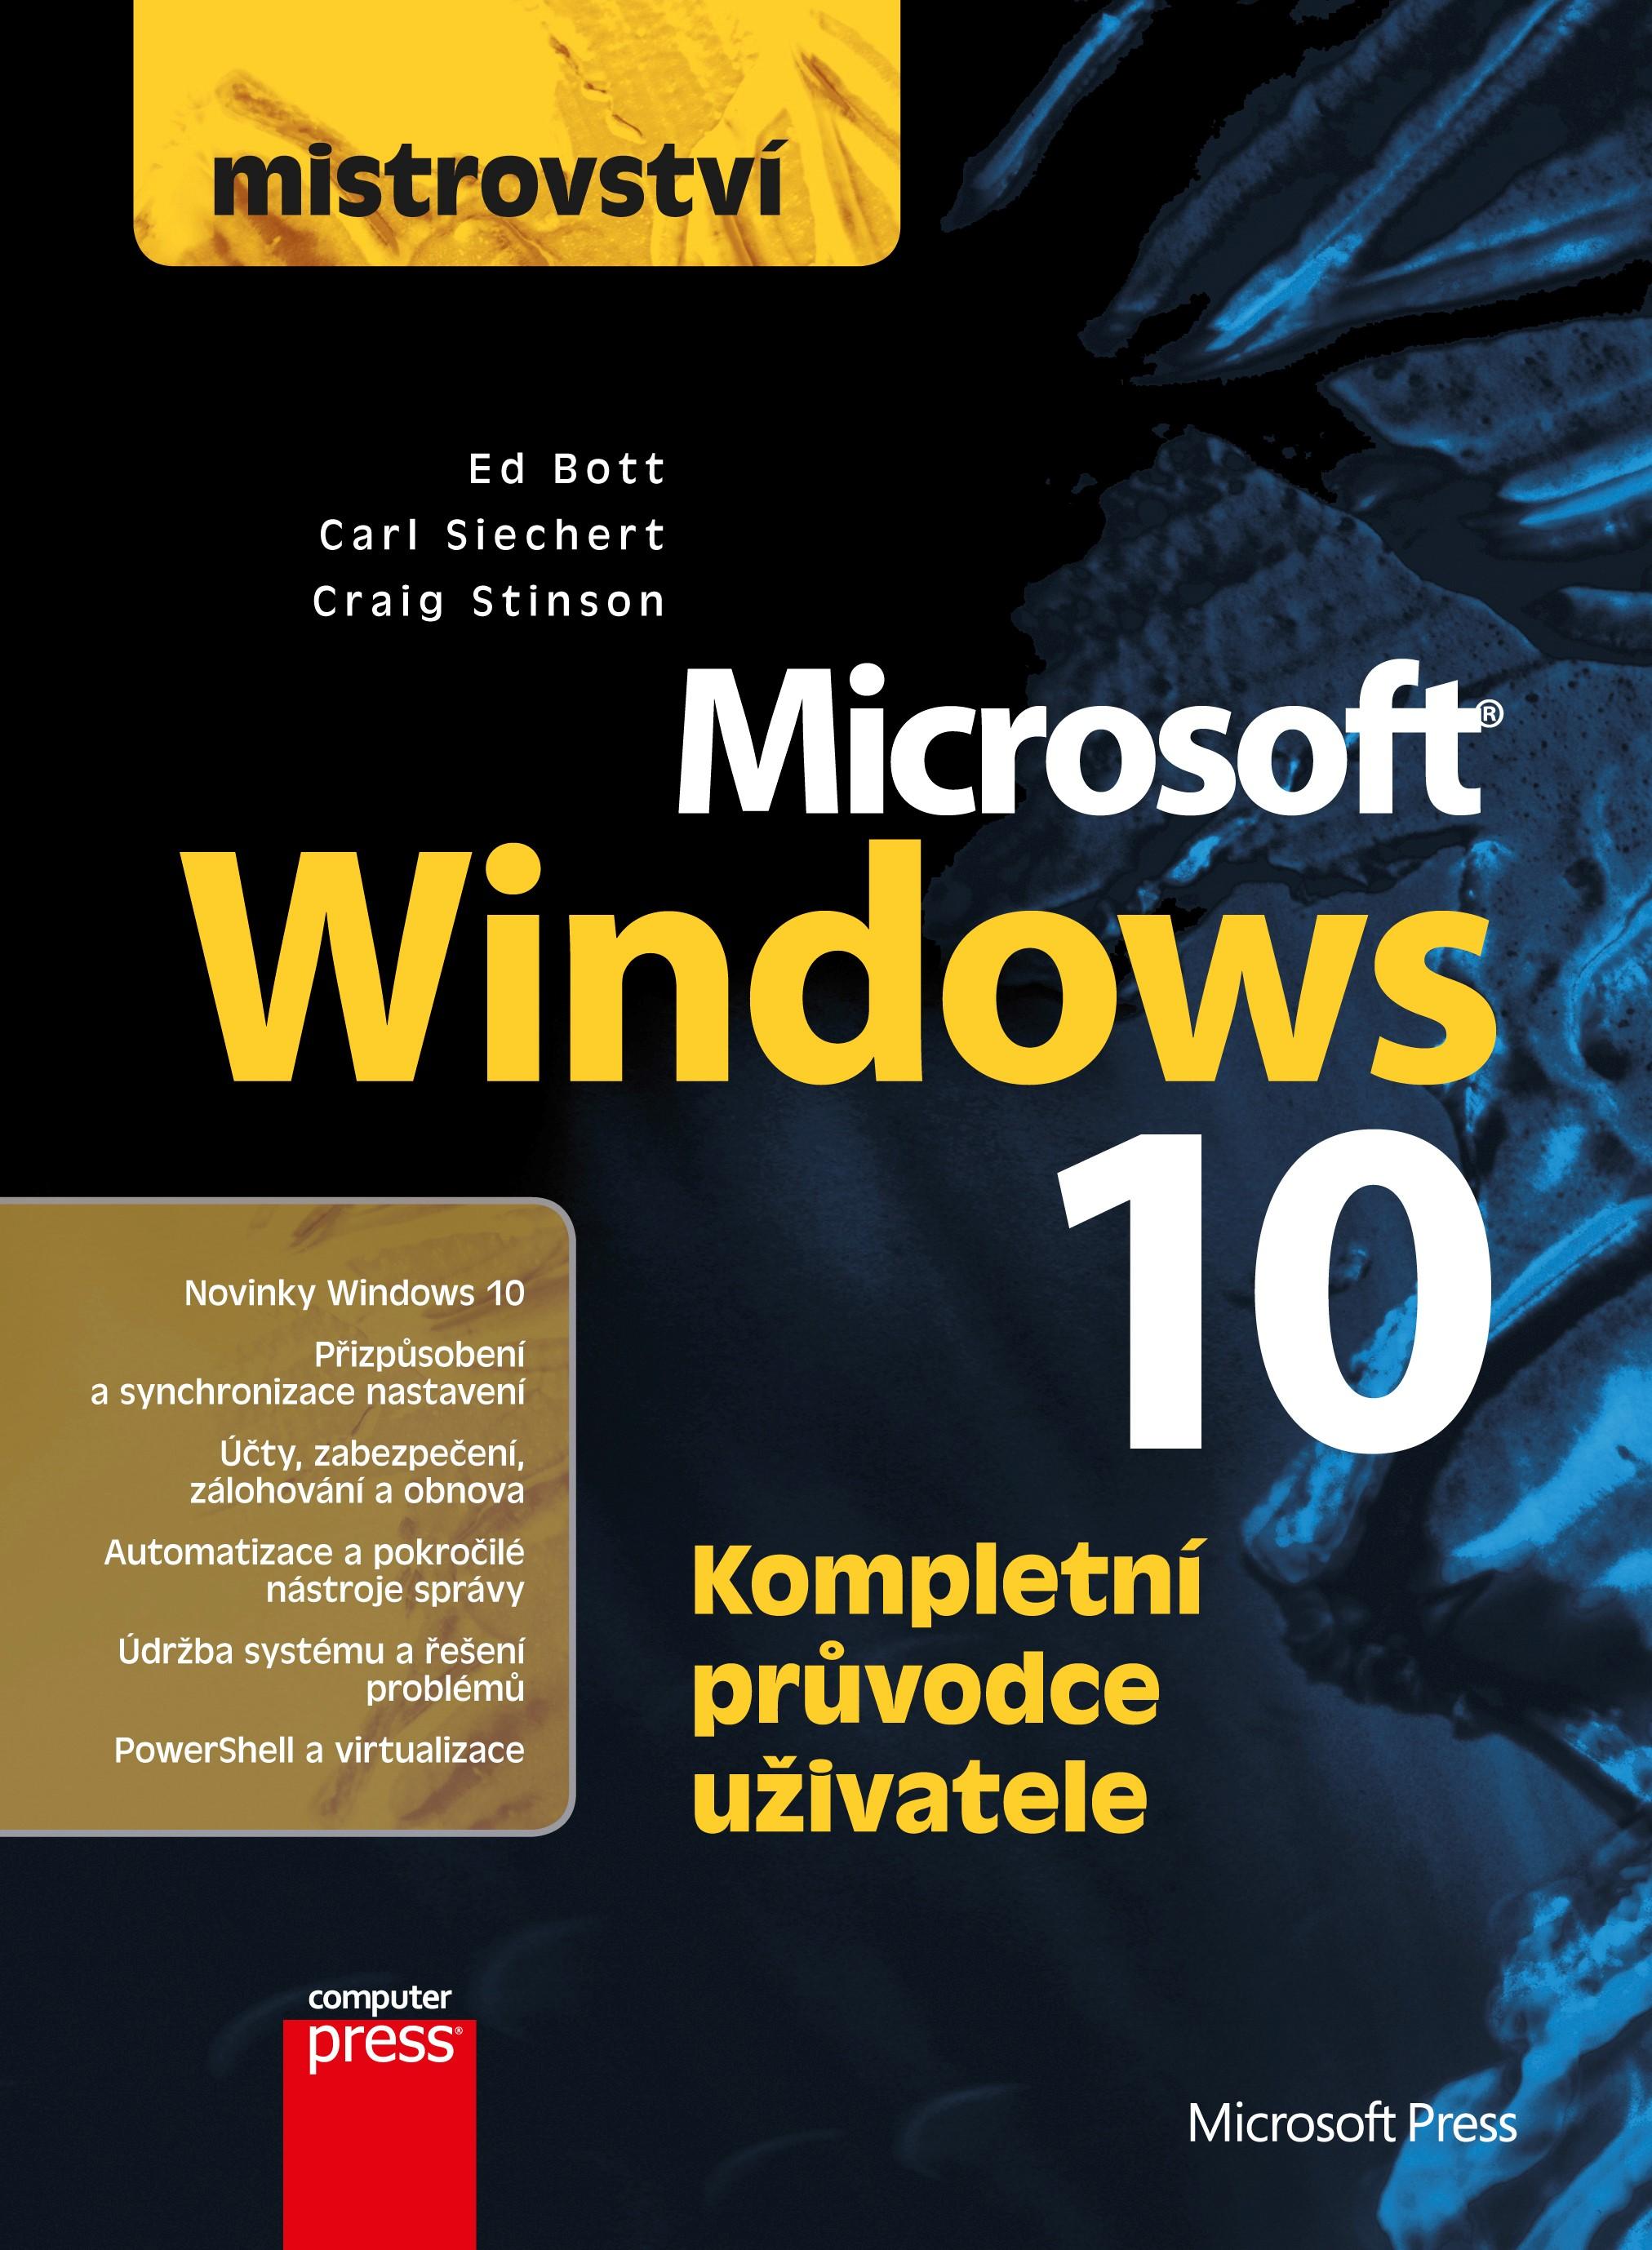 Mistrovství - Microsoft Windows 10   Ed Bott, Craig Stinson, Carl Siechert